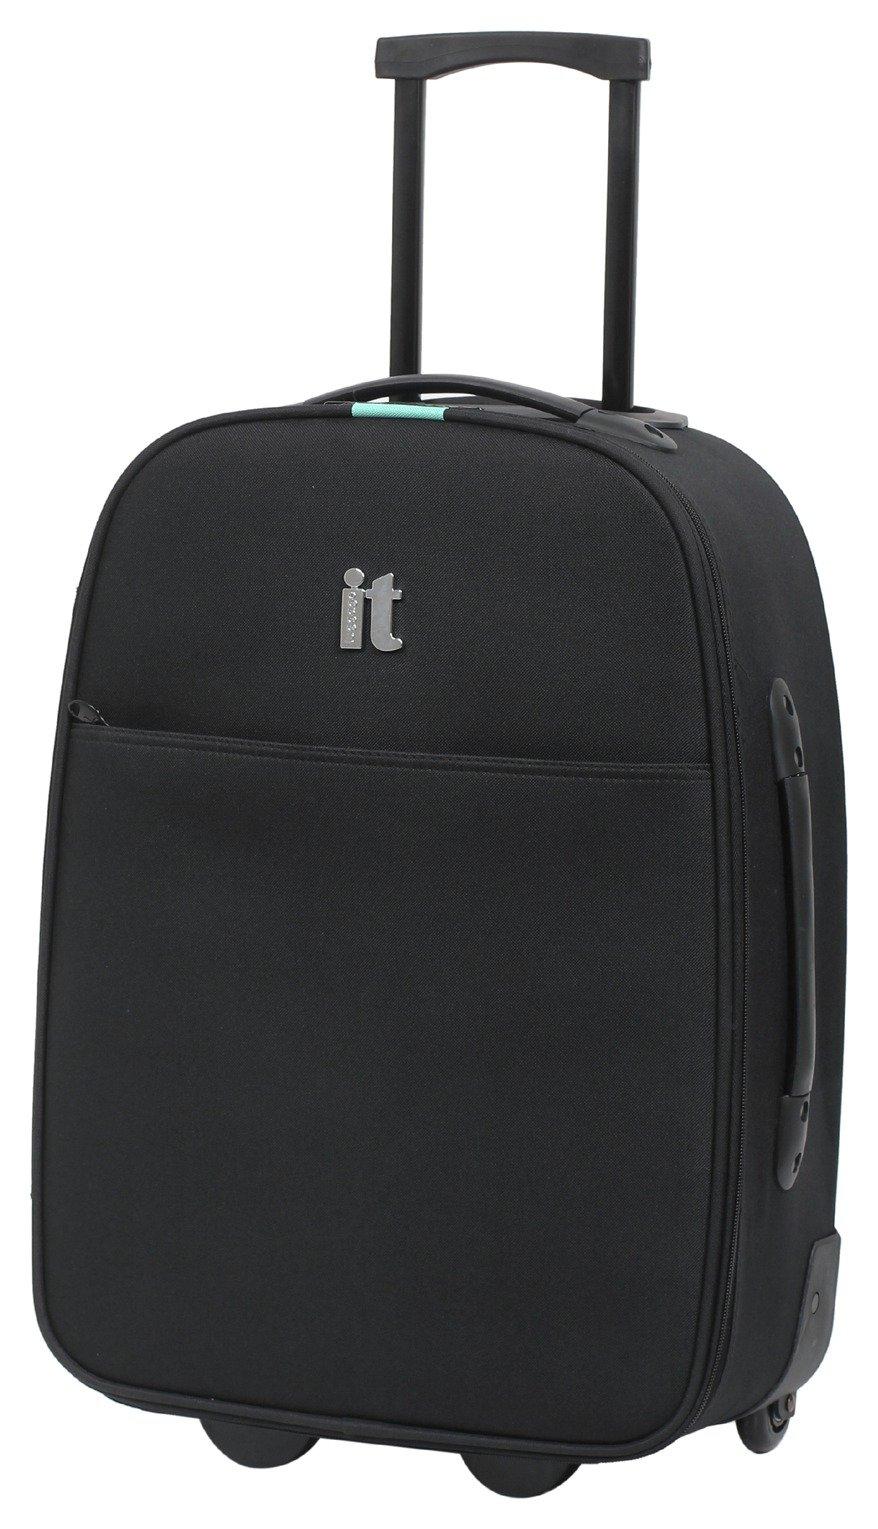 it Luggage 2 Wheel Soft Cabin Suitcase - Black